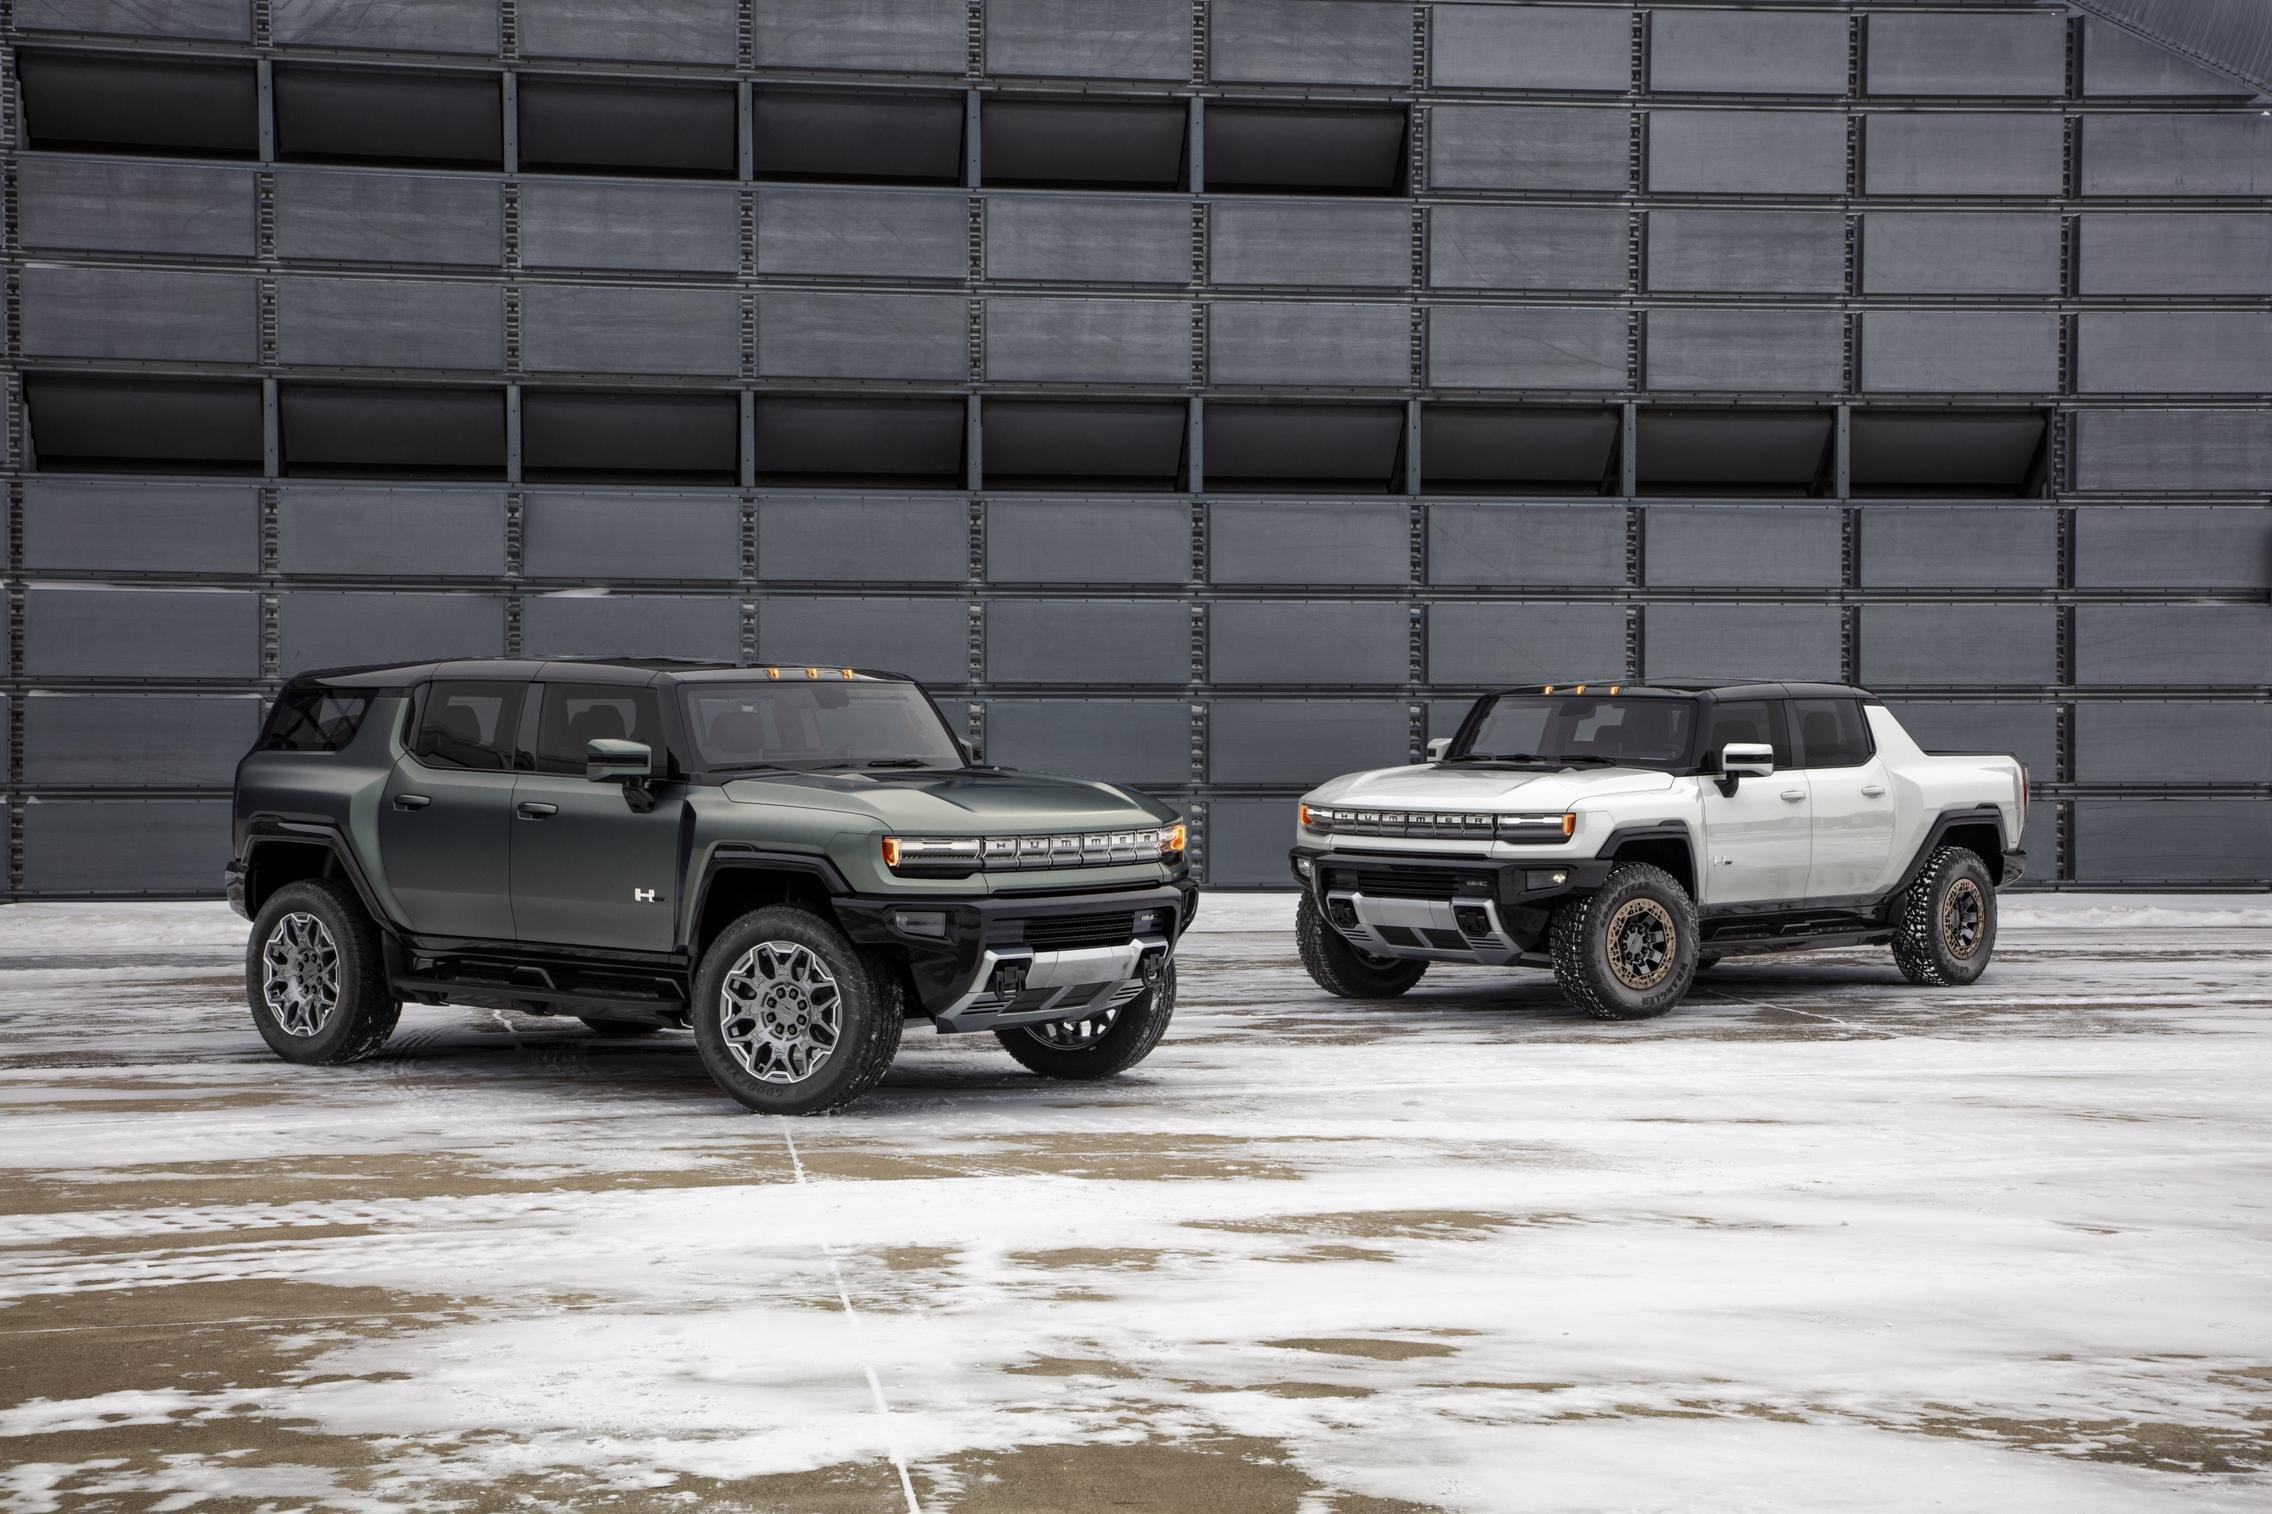 Hummer EV SUV vs Pickup